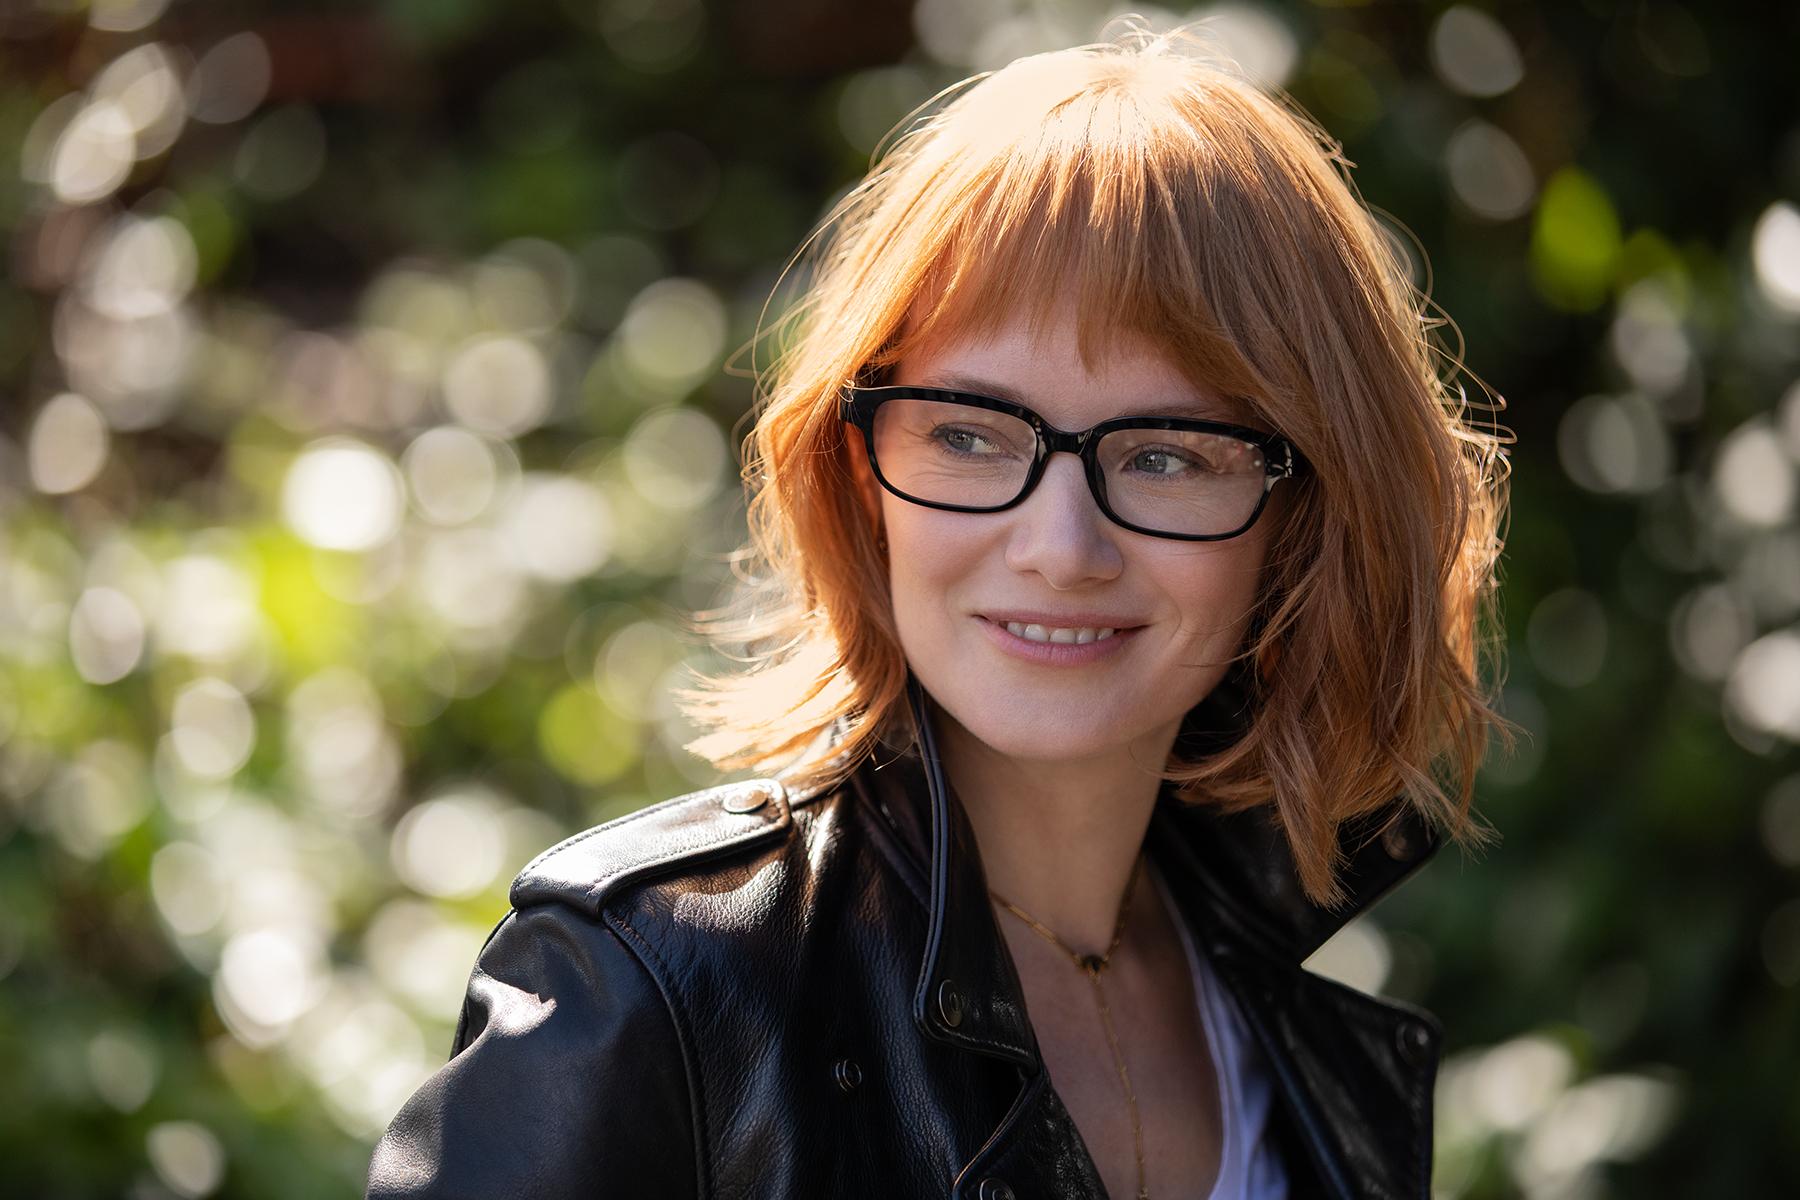 A woman wears Alexa-enabled eyeglasses, called Echo Frames.